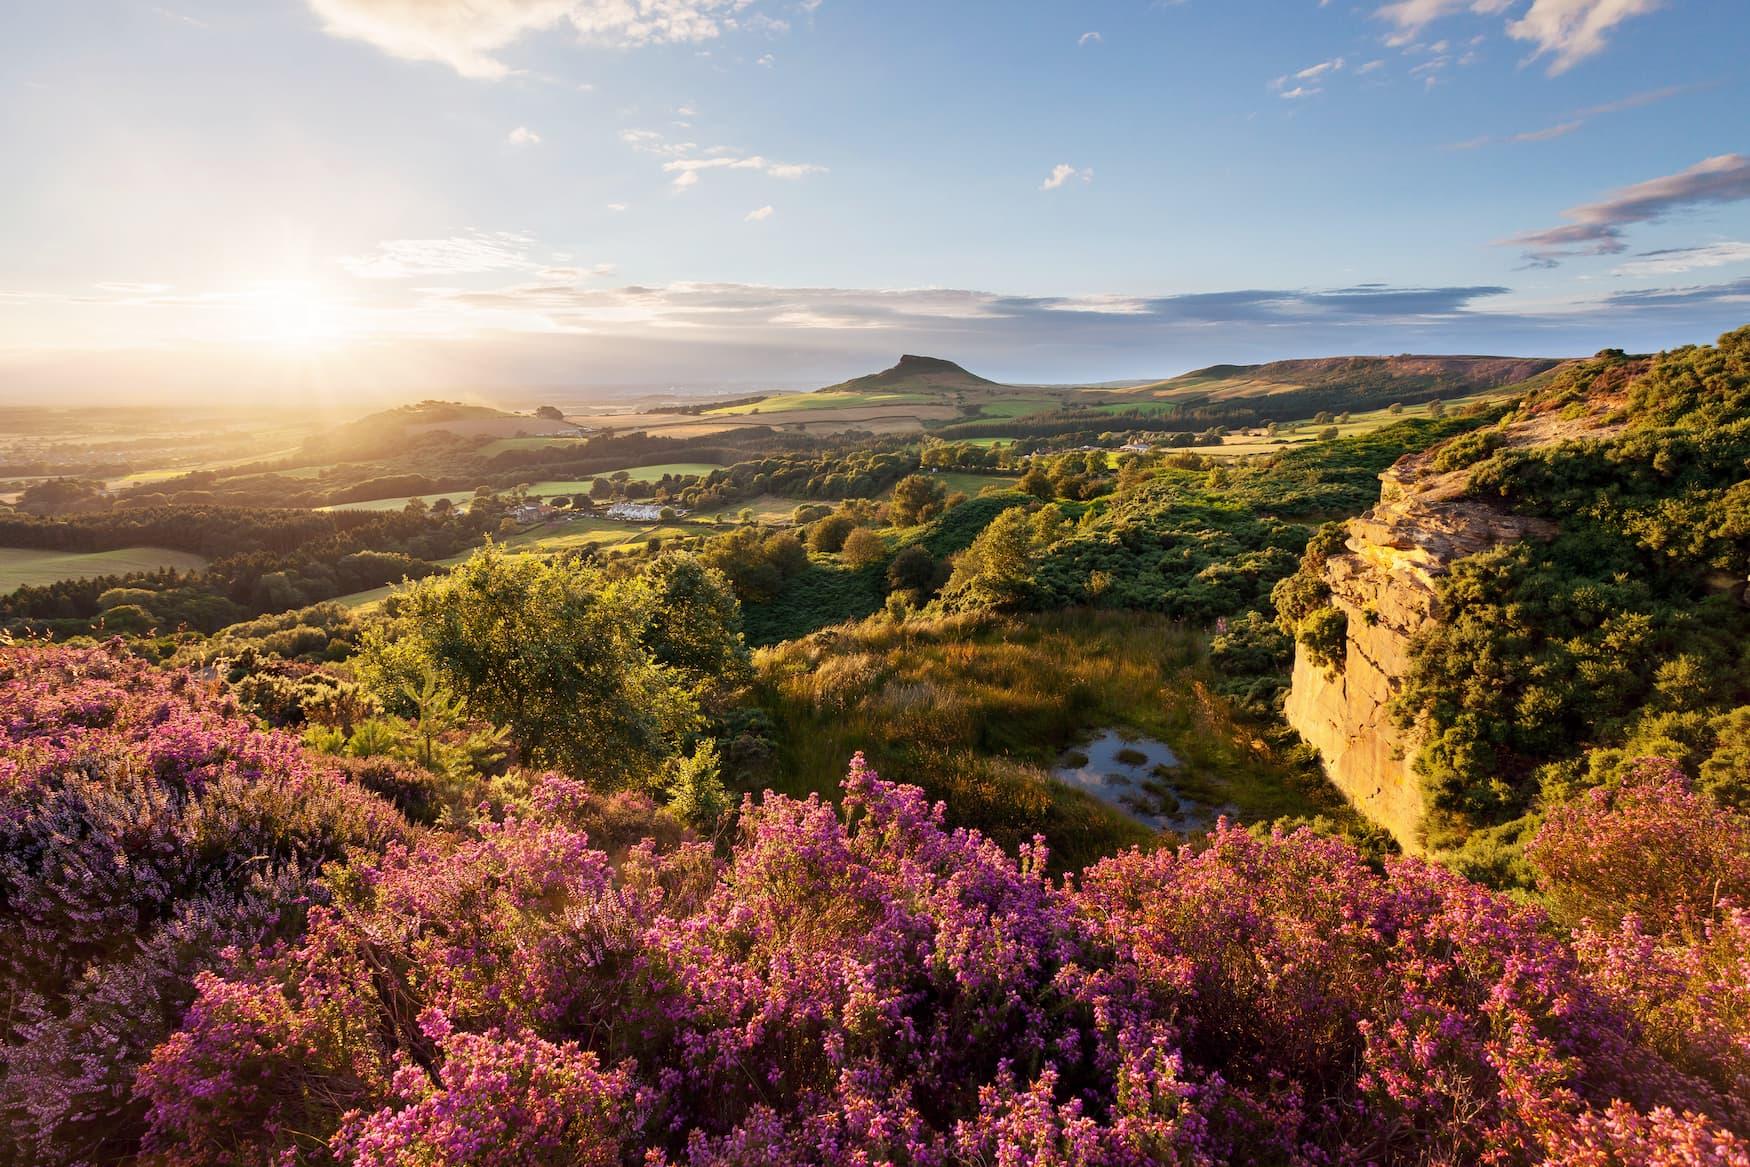 Sonnenuntergang im North York Moors Nationalpark in Großbritannien